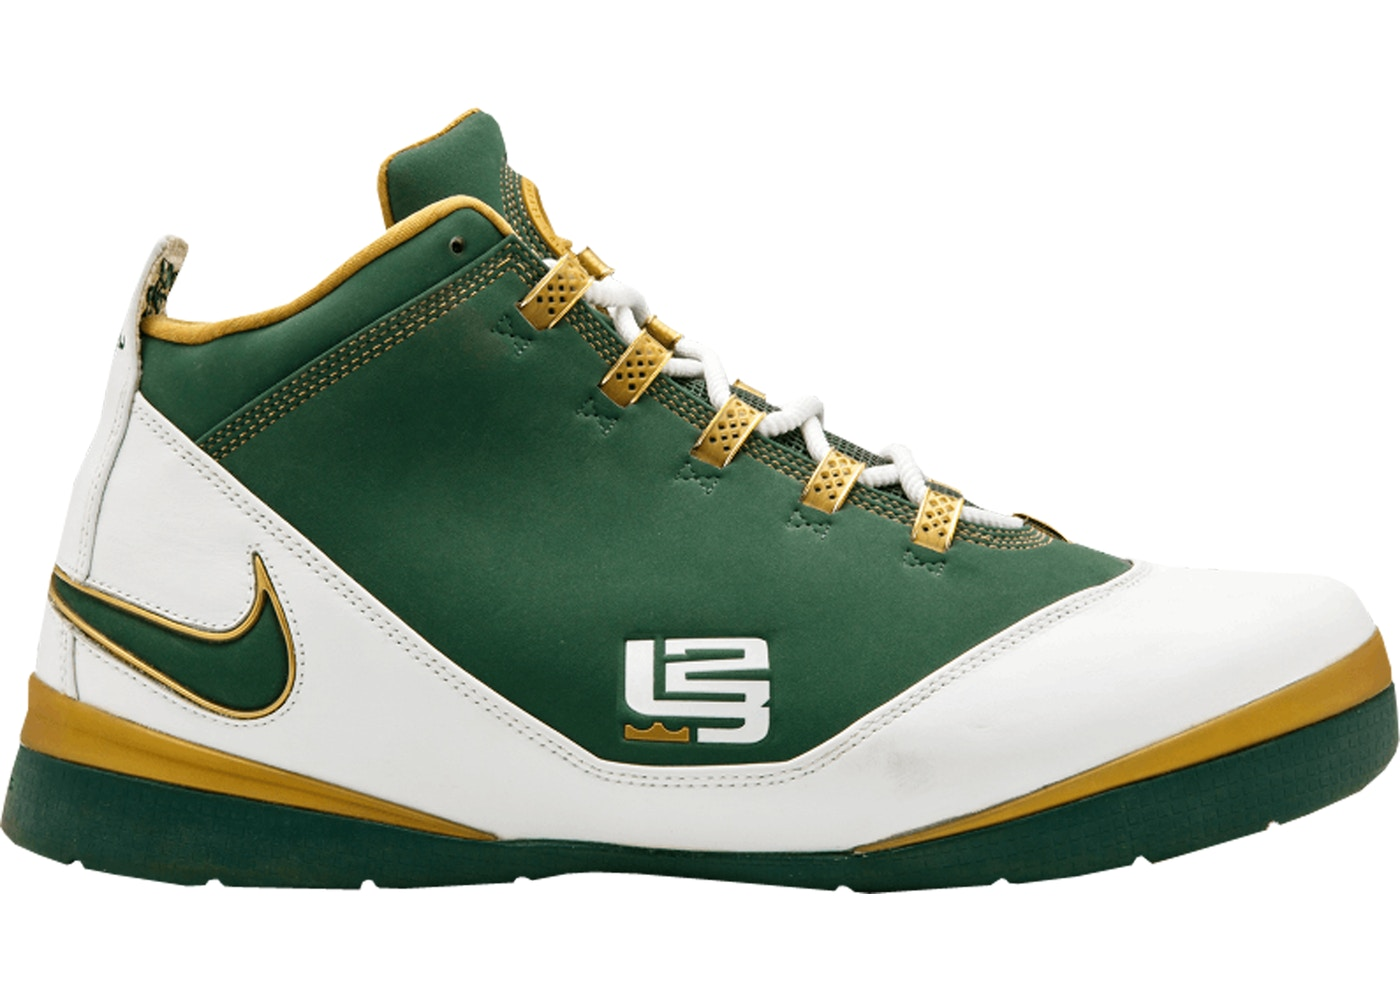 Nike Lebron Soldier SVSM 9.5 2008